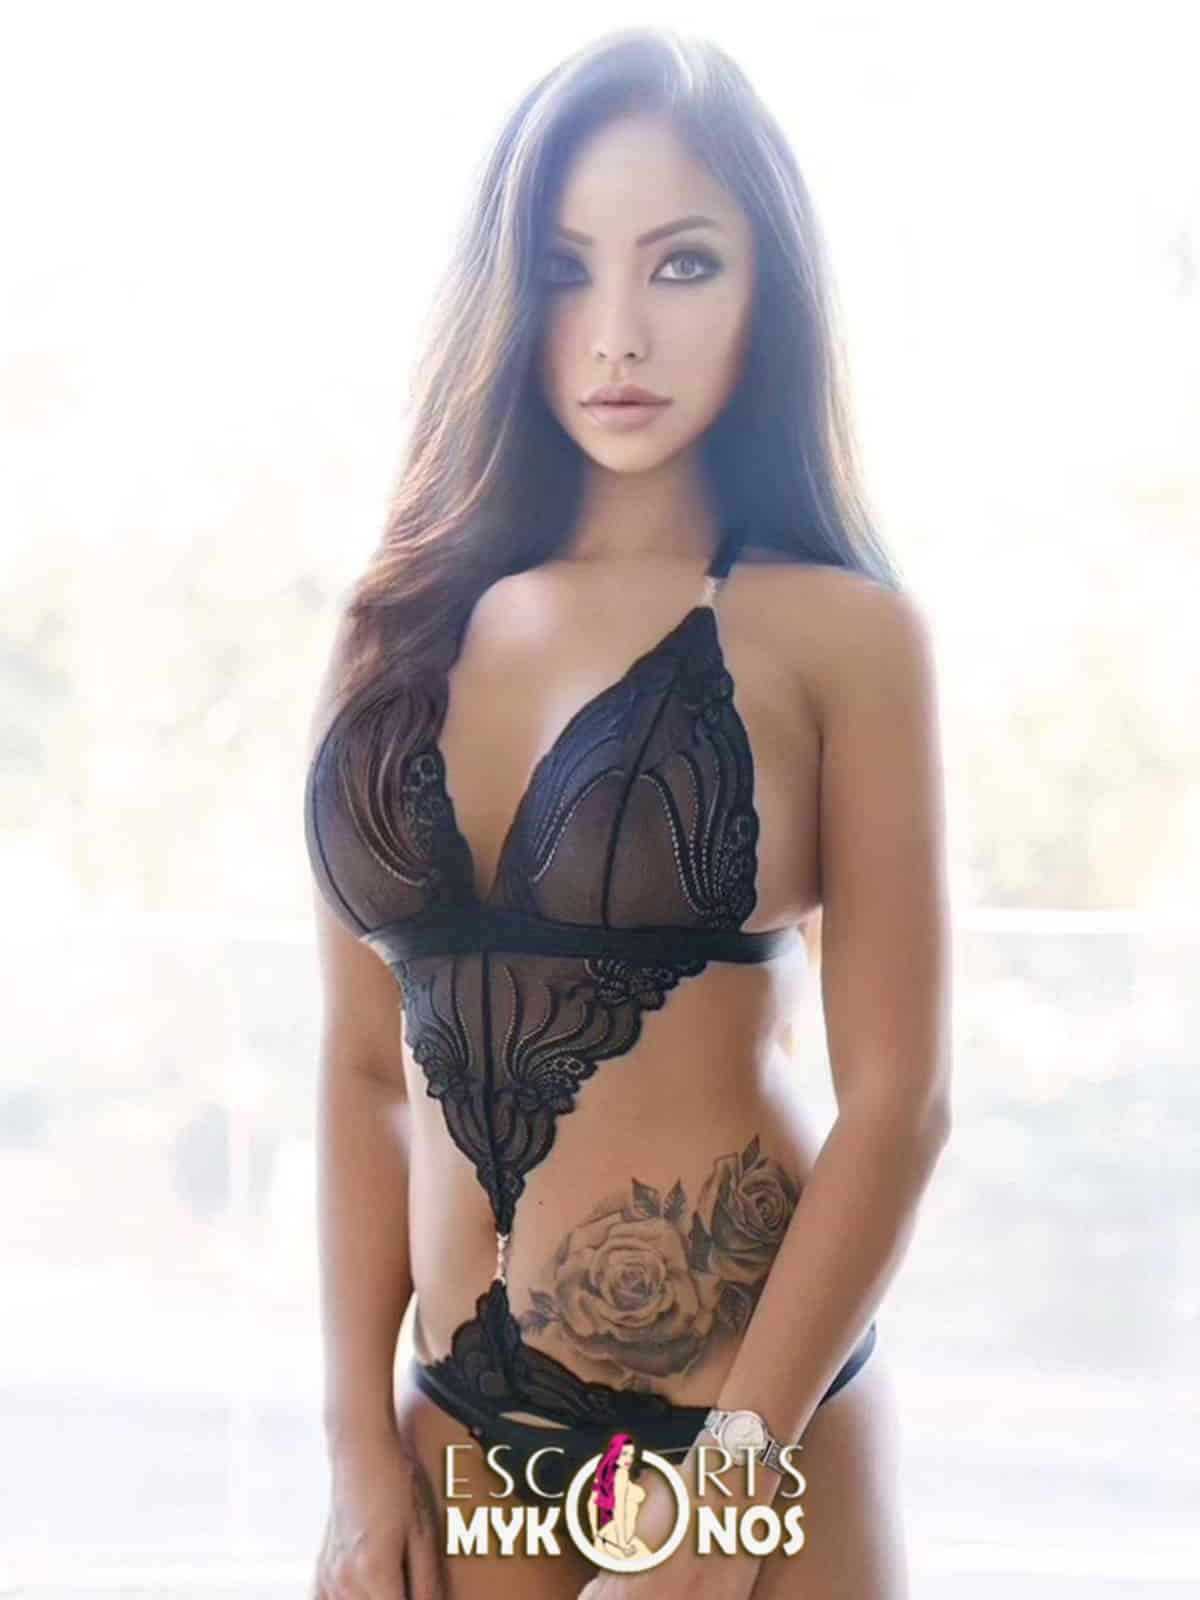 Asian Playmate Mykonos Angelina Gray